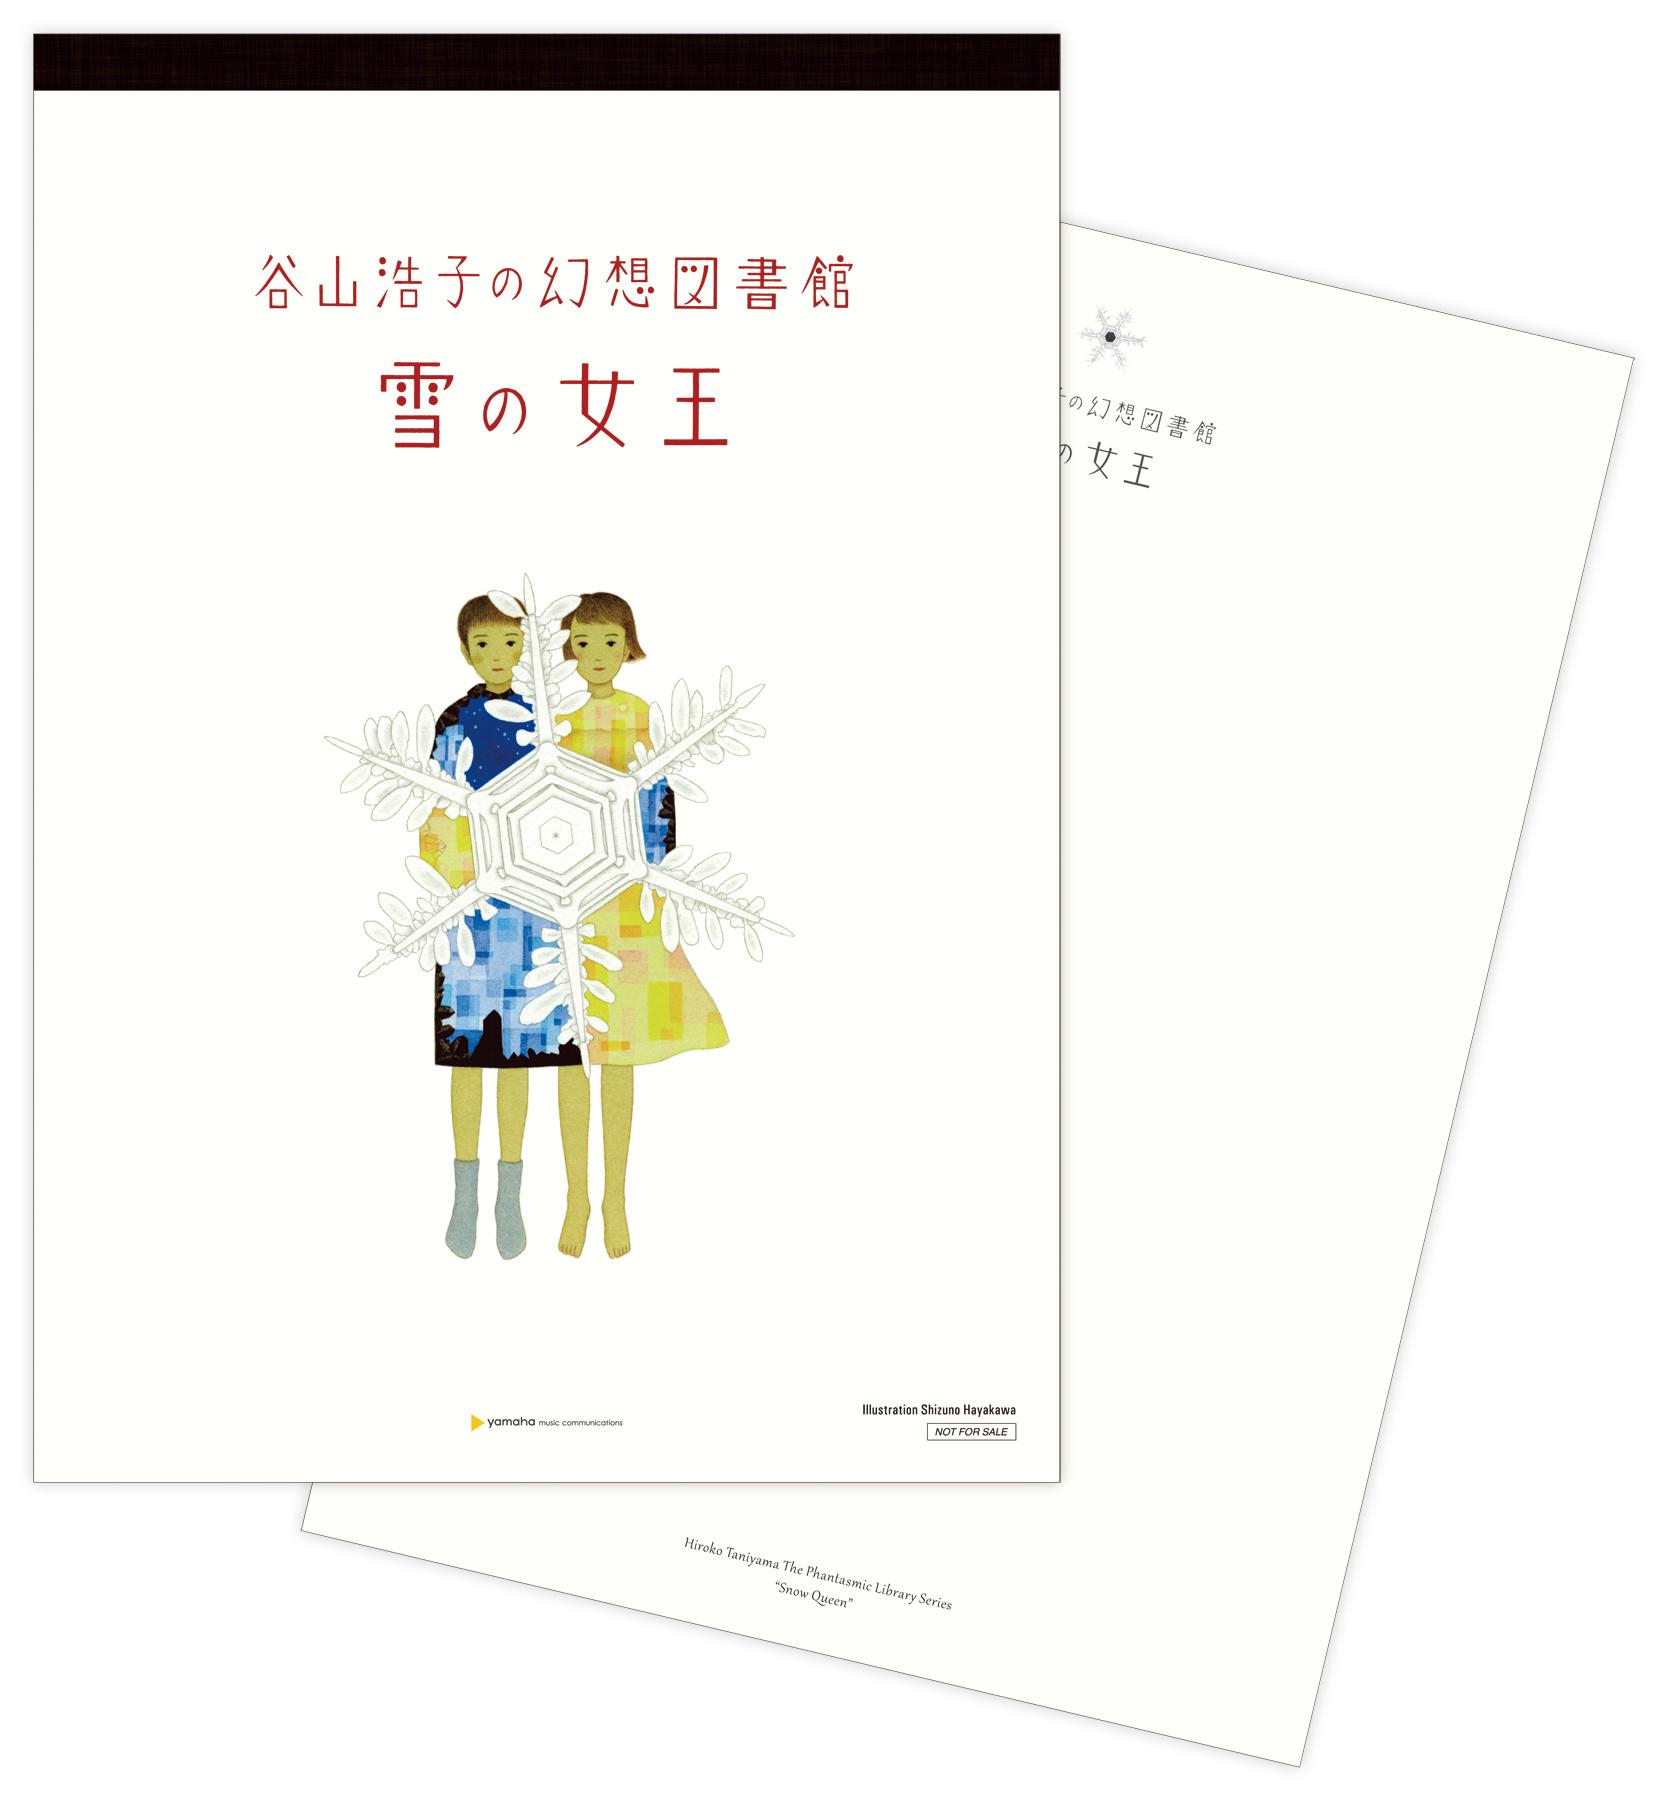 『谷山浩子の幻想図書館 雪の女王』Amazon 限定特典(便箋)